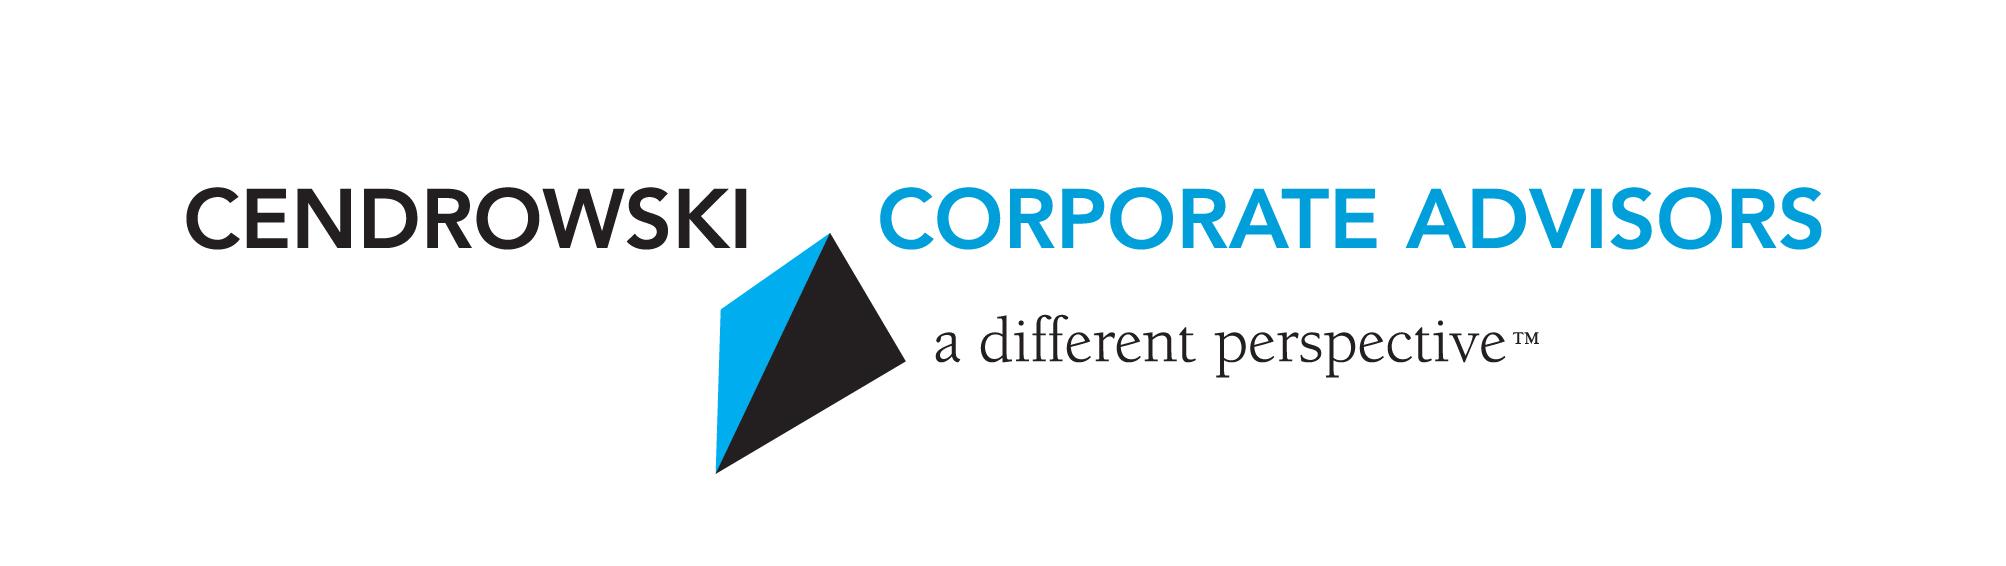 Cendrowski Corporate Advisors